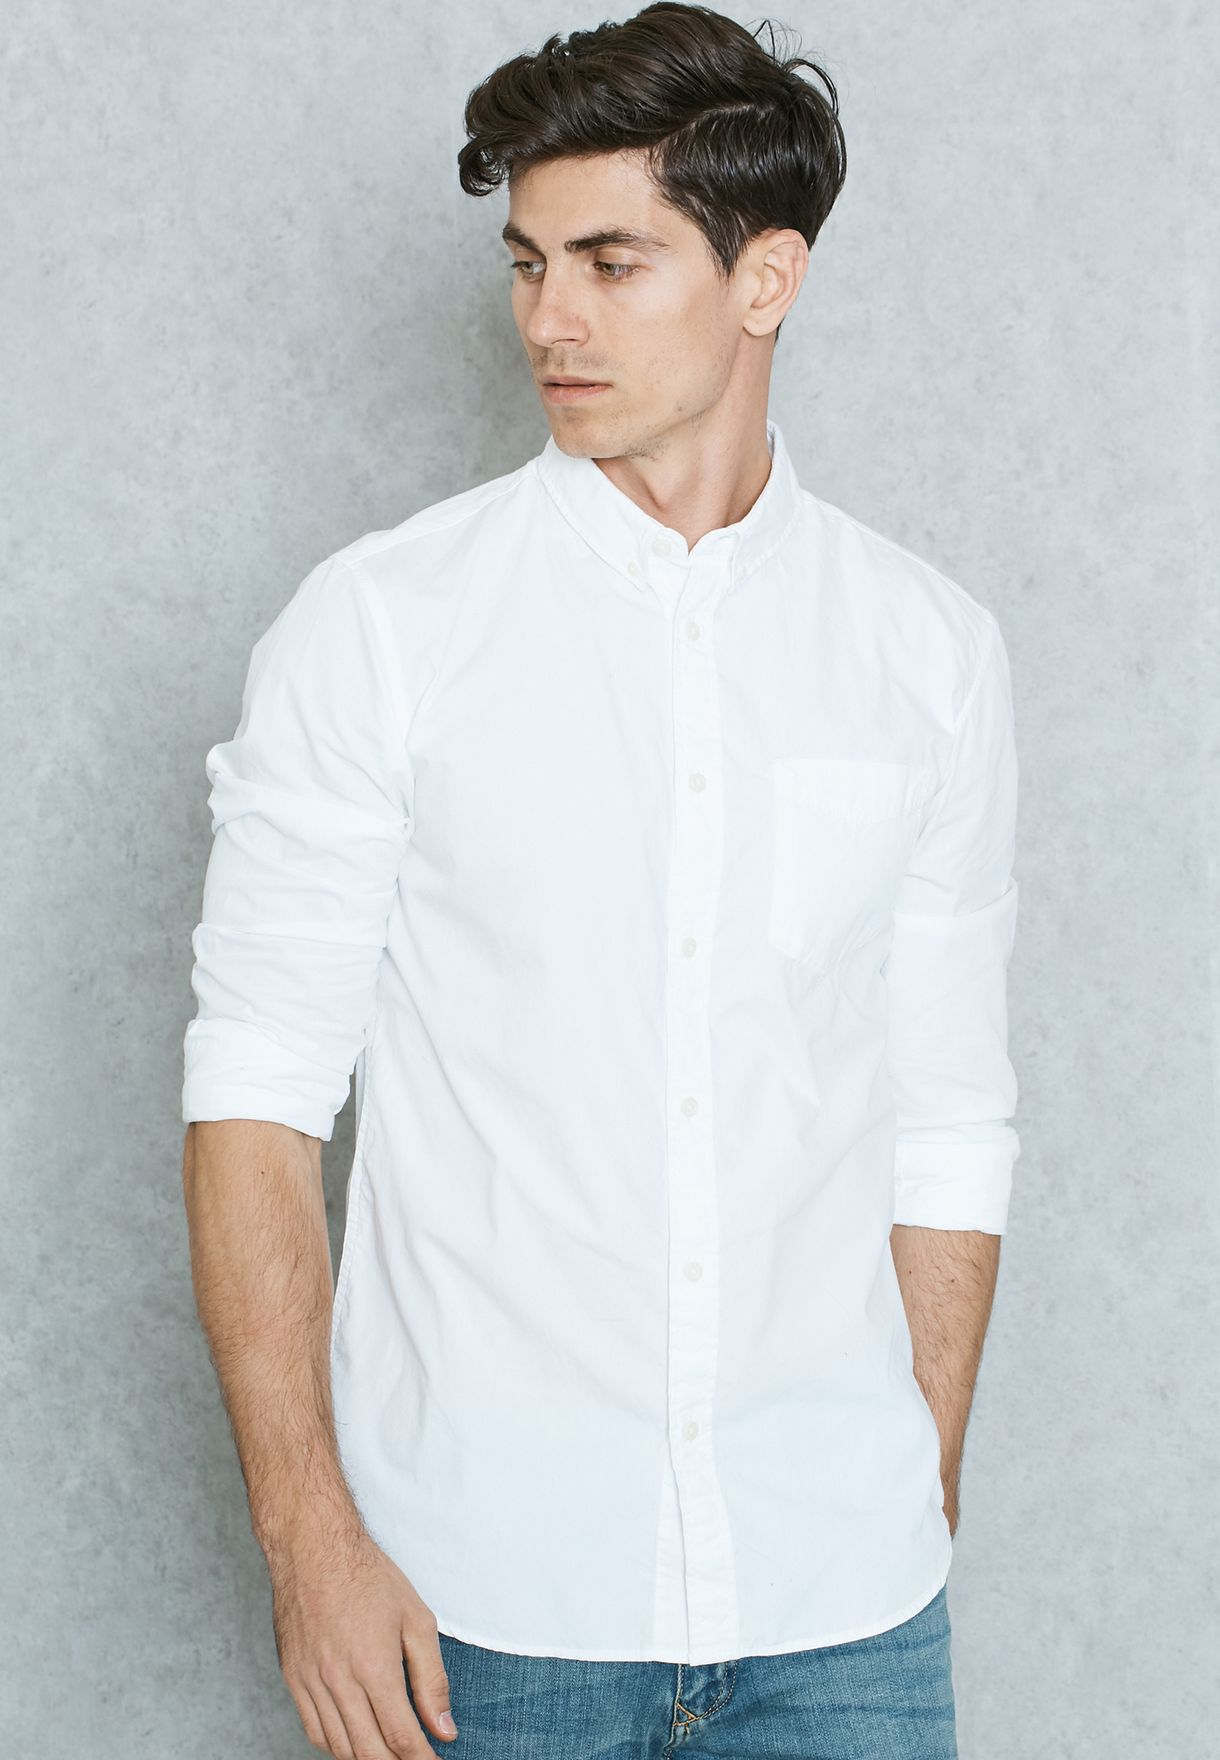 12118138 White Jones Qatar Jack For Slim Shop Men Fit In Shirt EBY4fxTqw